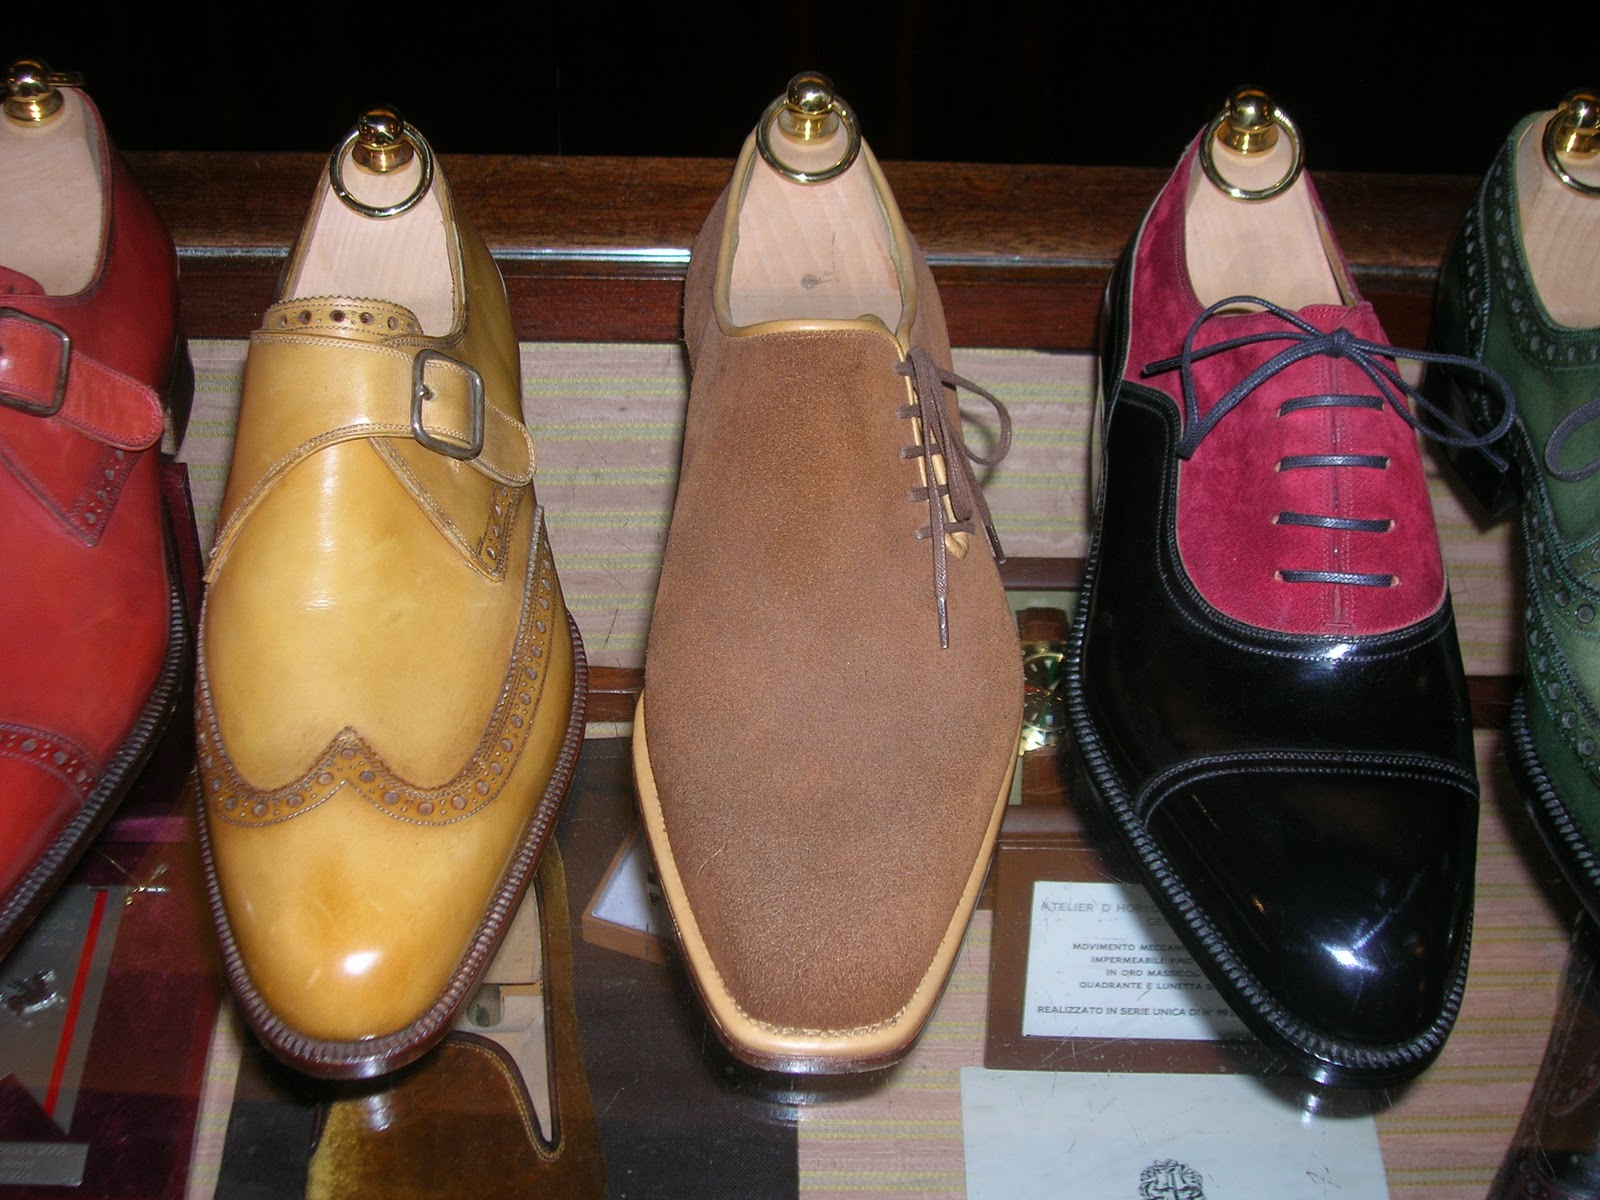 Happy Holidays! The Shoe Snob Blog